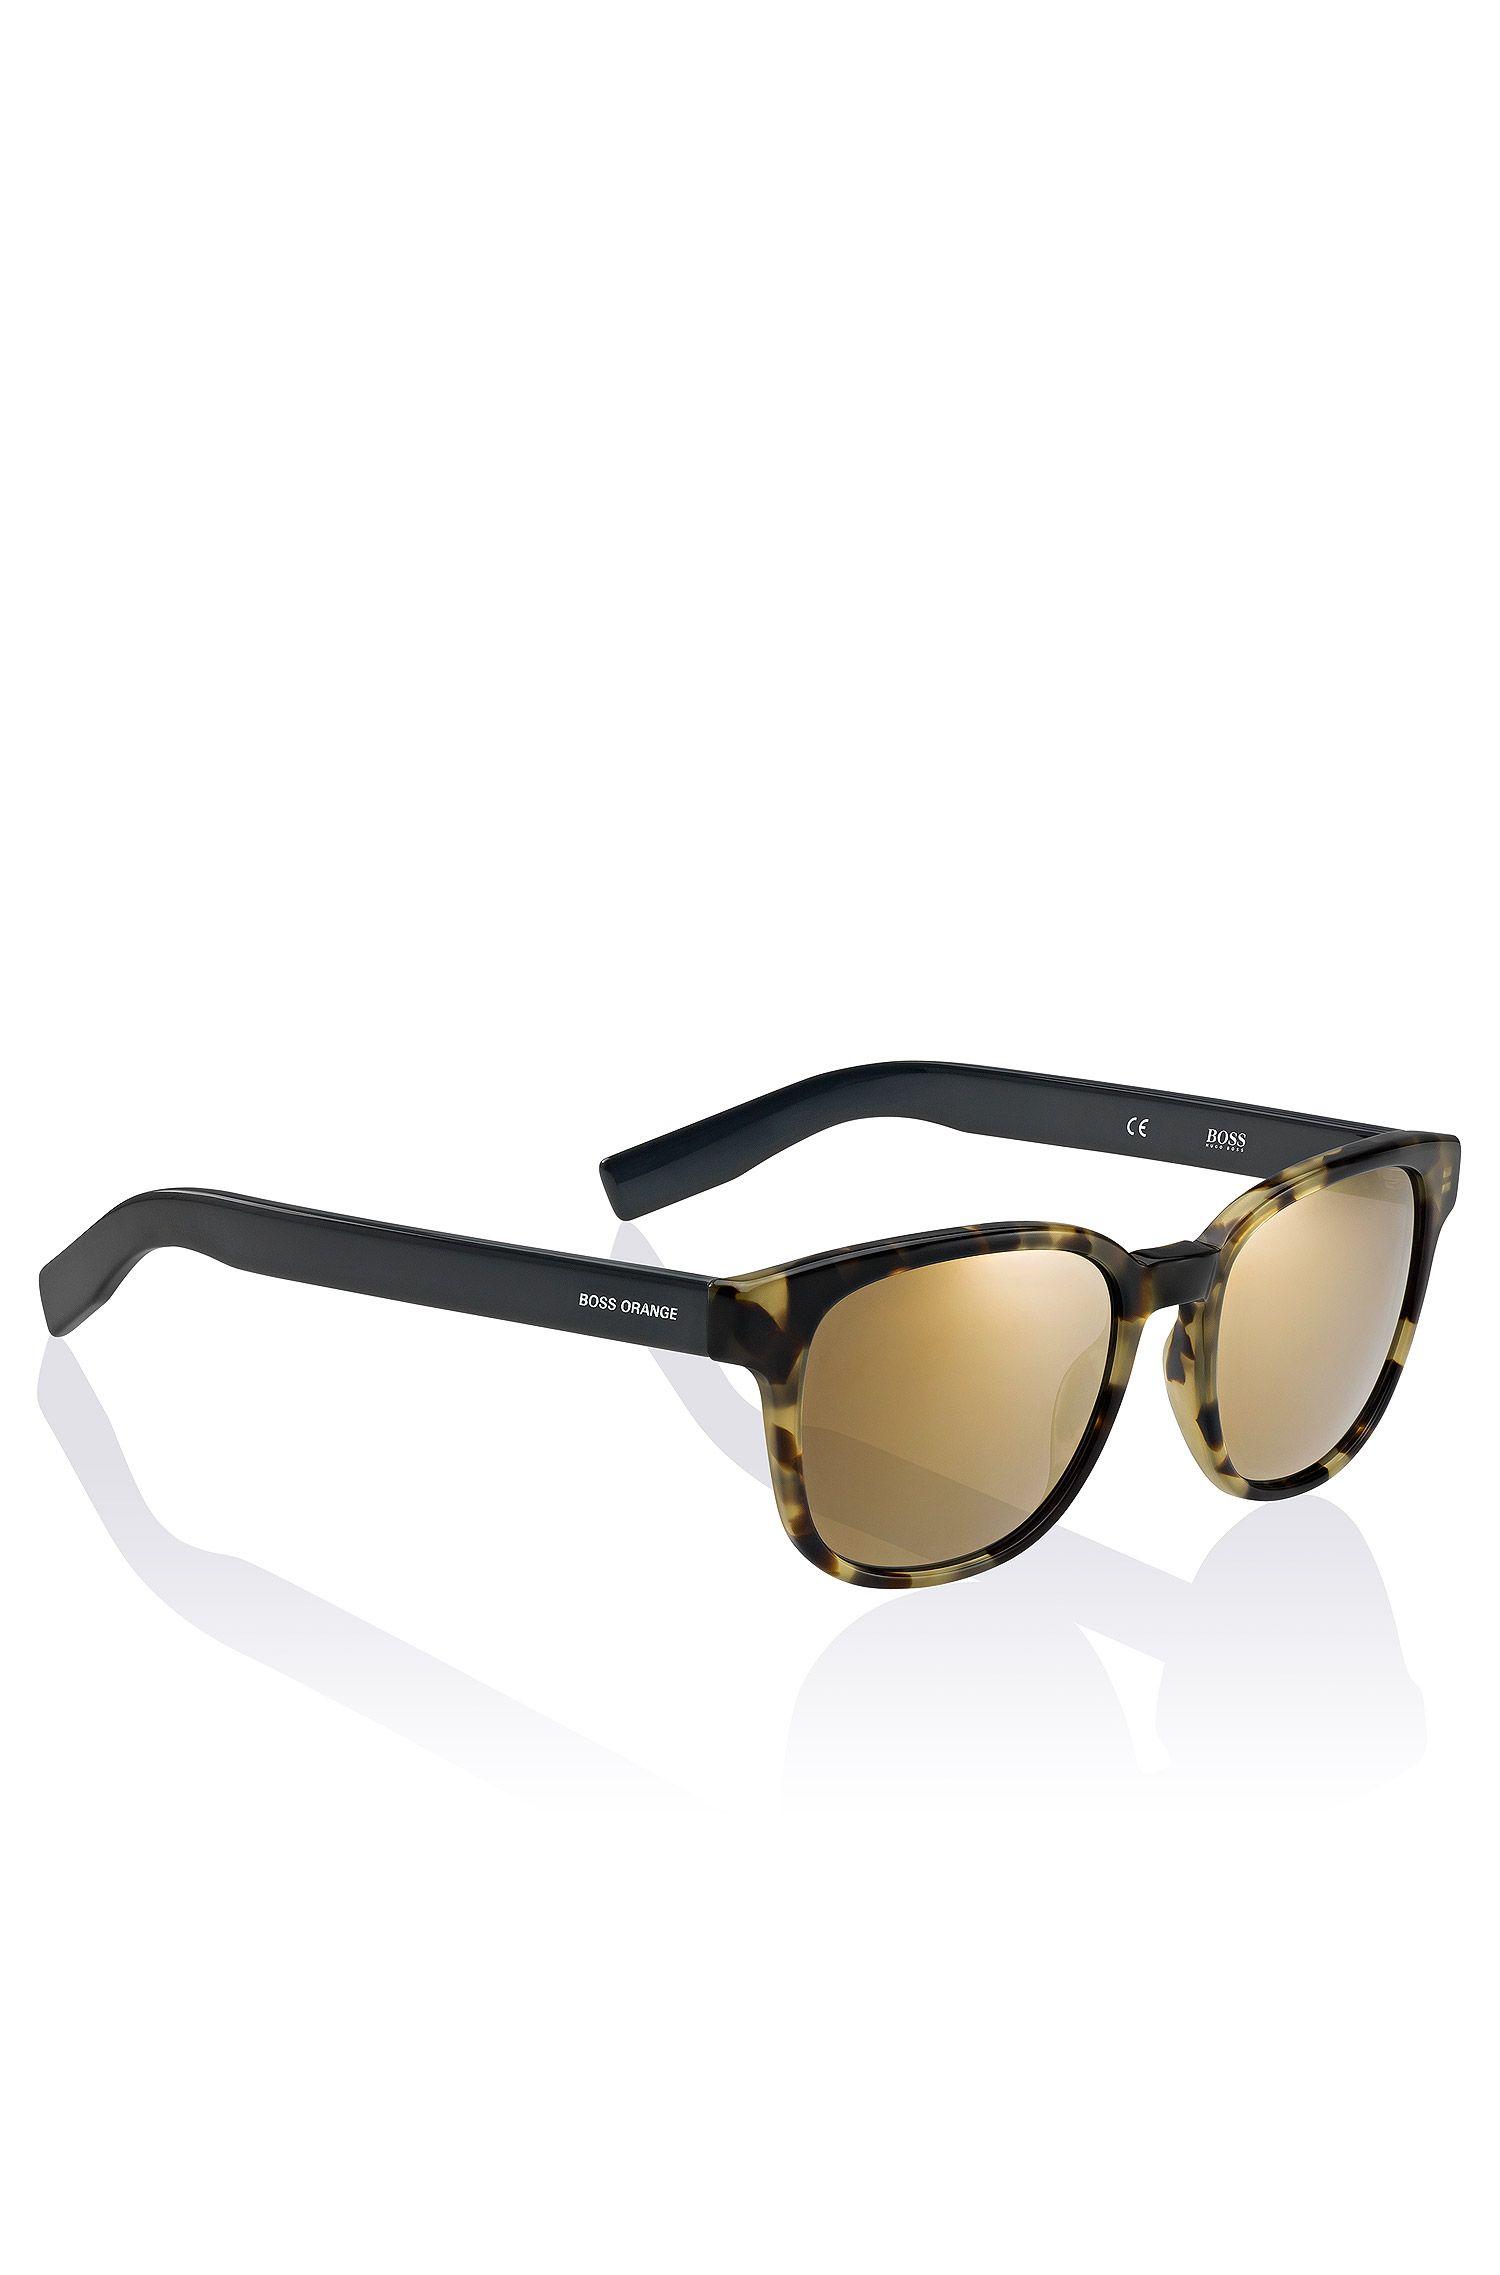 Wayfarer-zonnebril 'BO 0193'